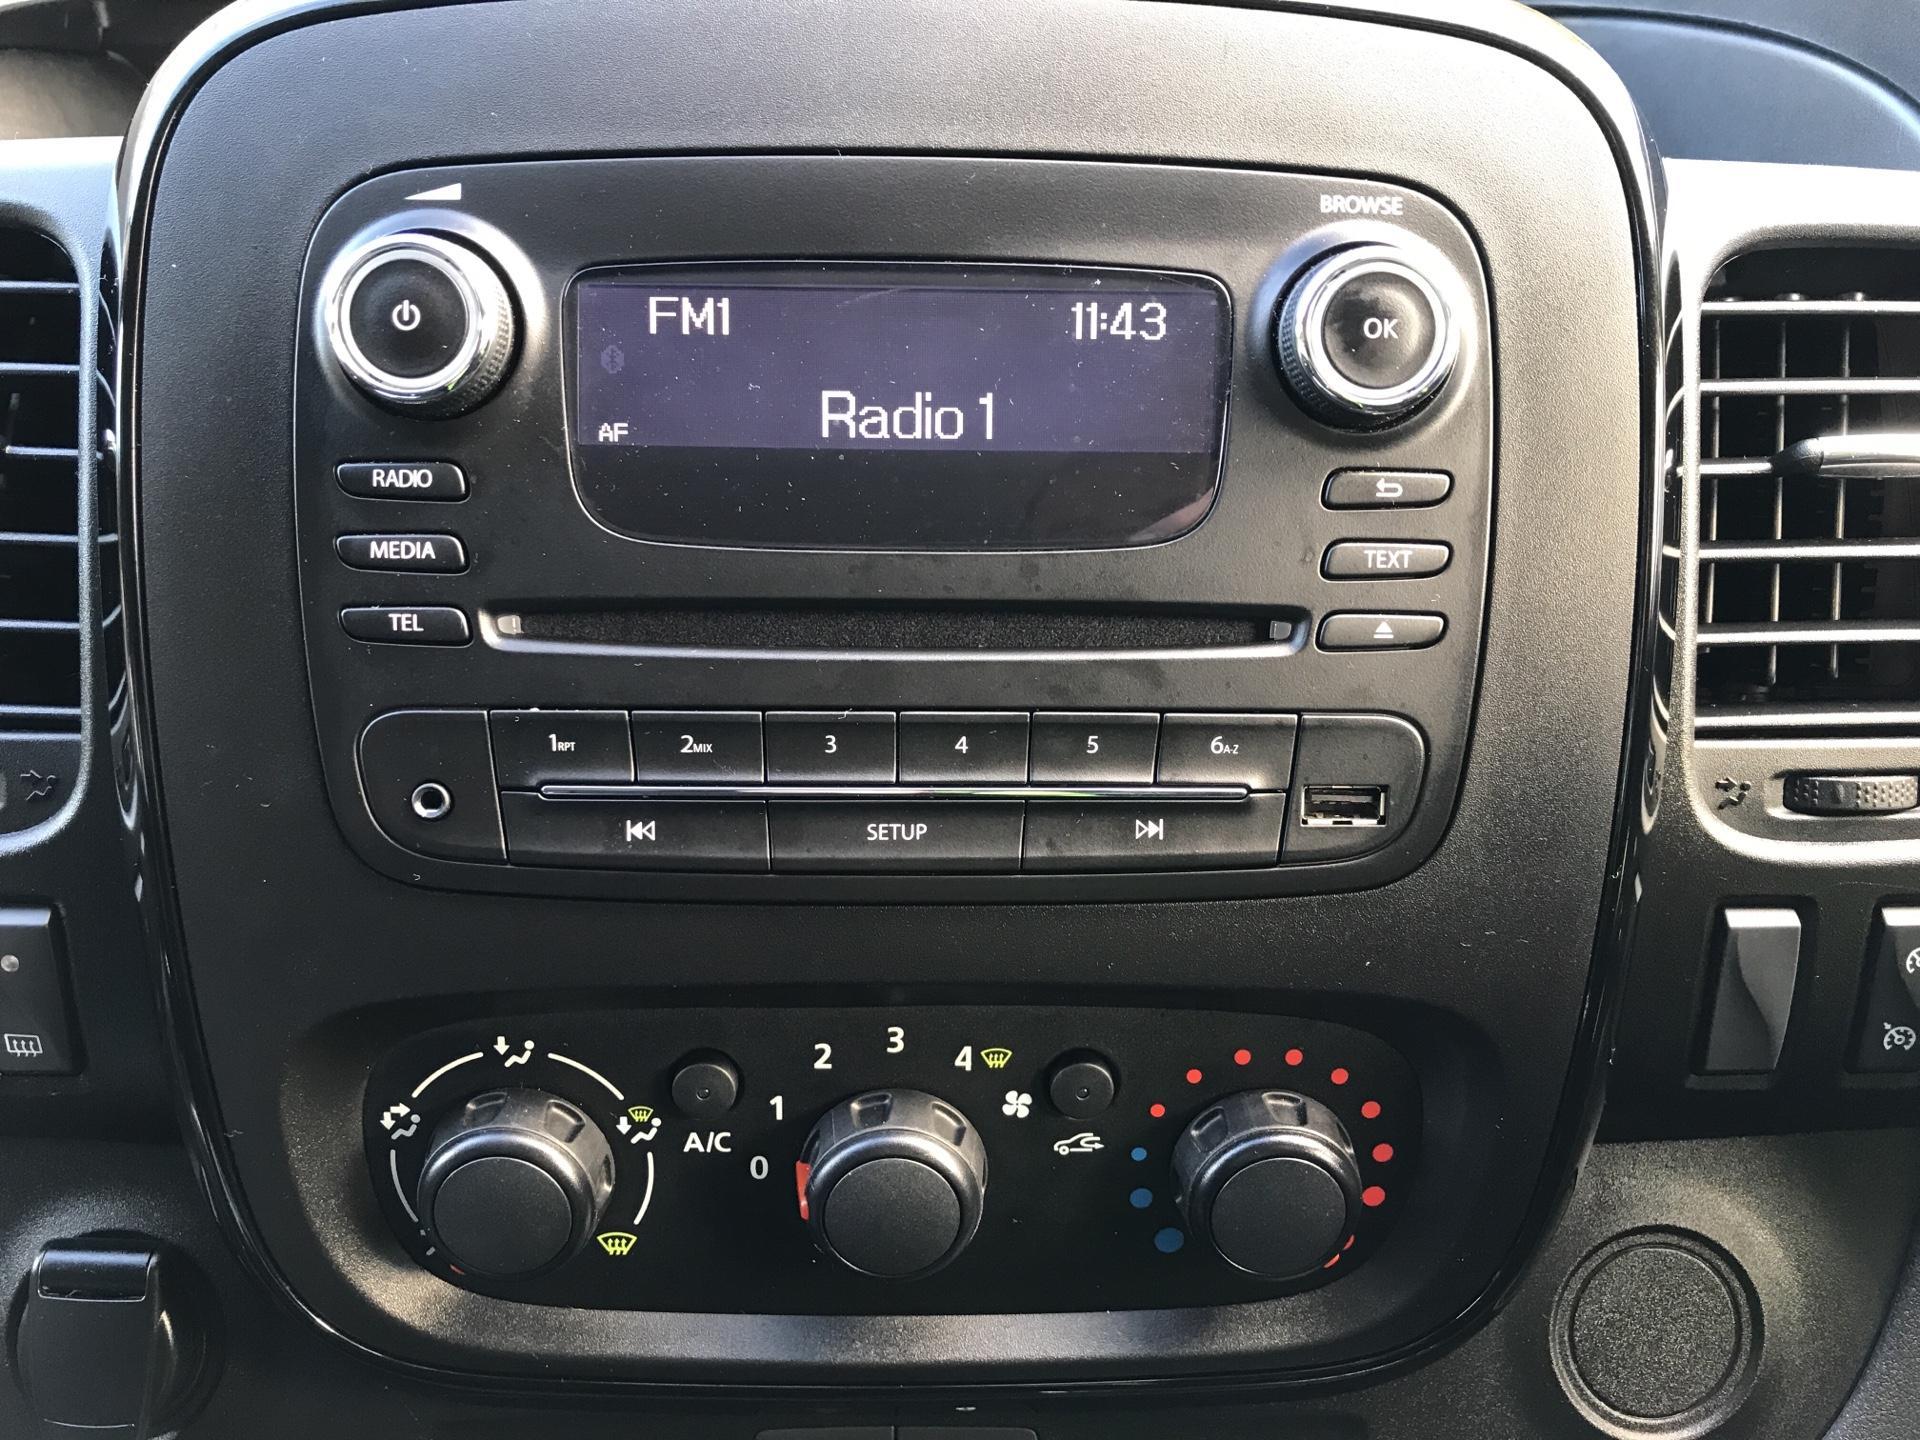 2017 Vauxhall Vivaro L1 H1 2700 1.6 CDTI 120PS SPORTIVE EURO 6 (ND17UNH) Image 10